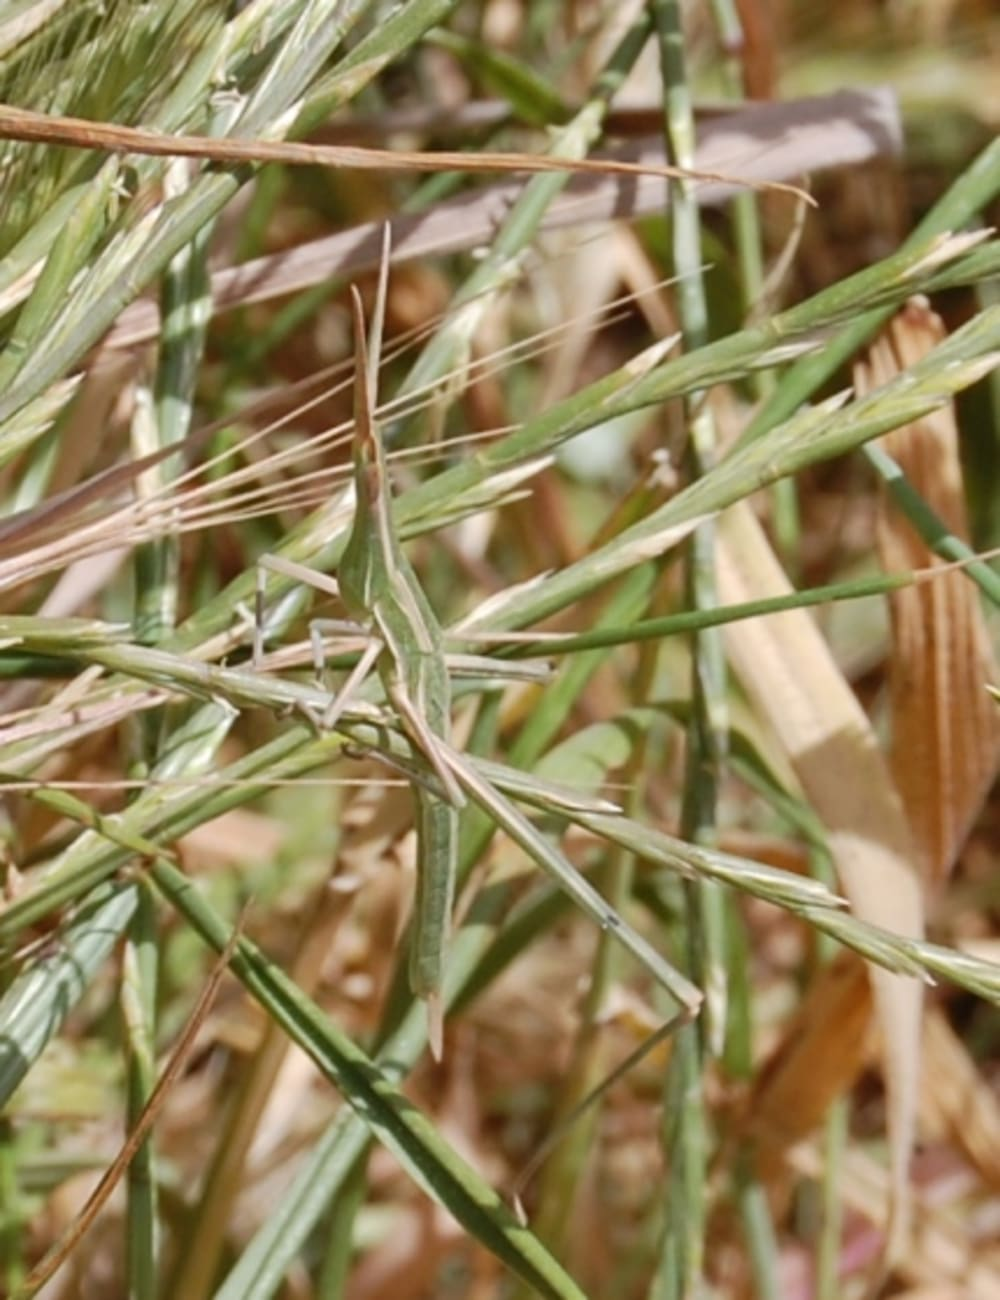 Nosed grasshopper - Acrida hungarica